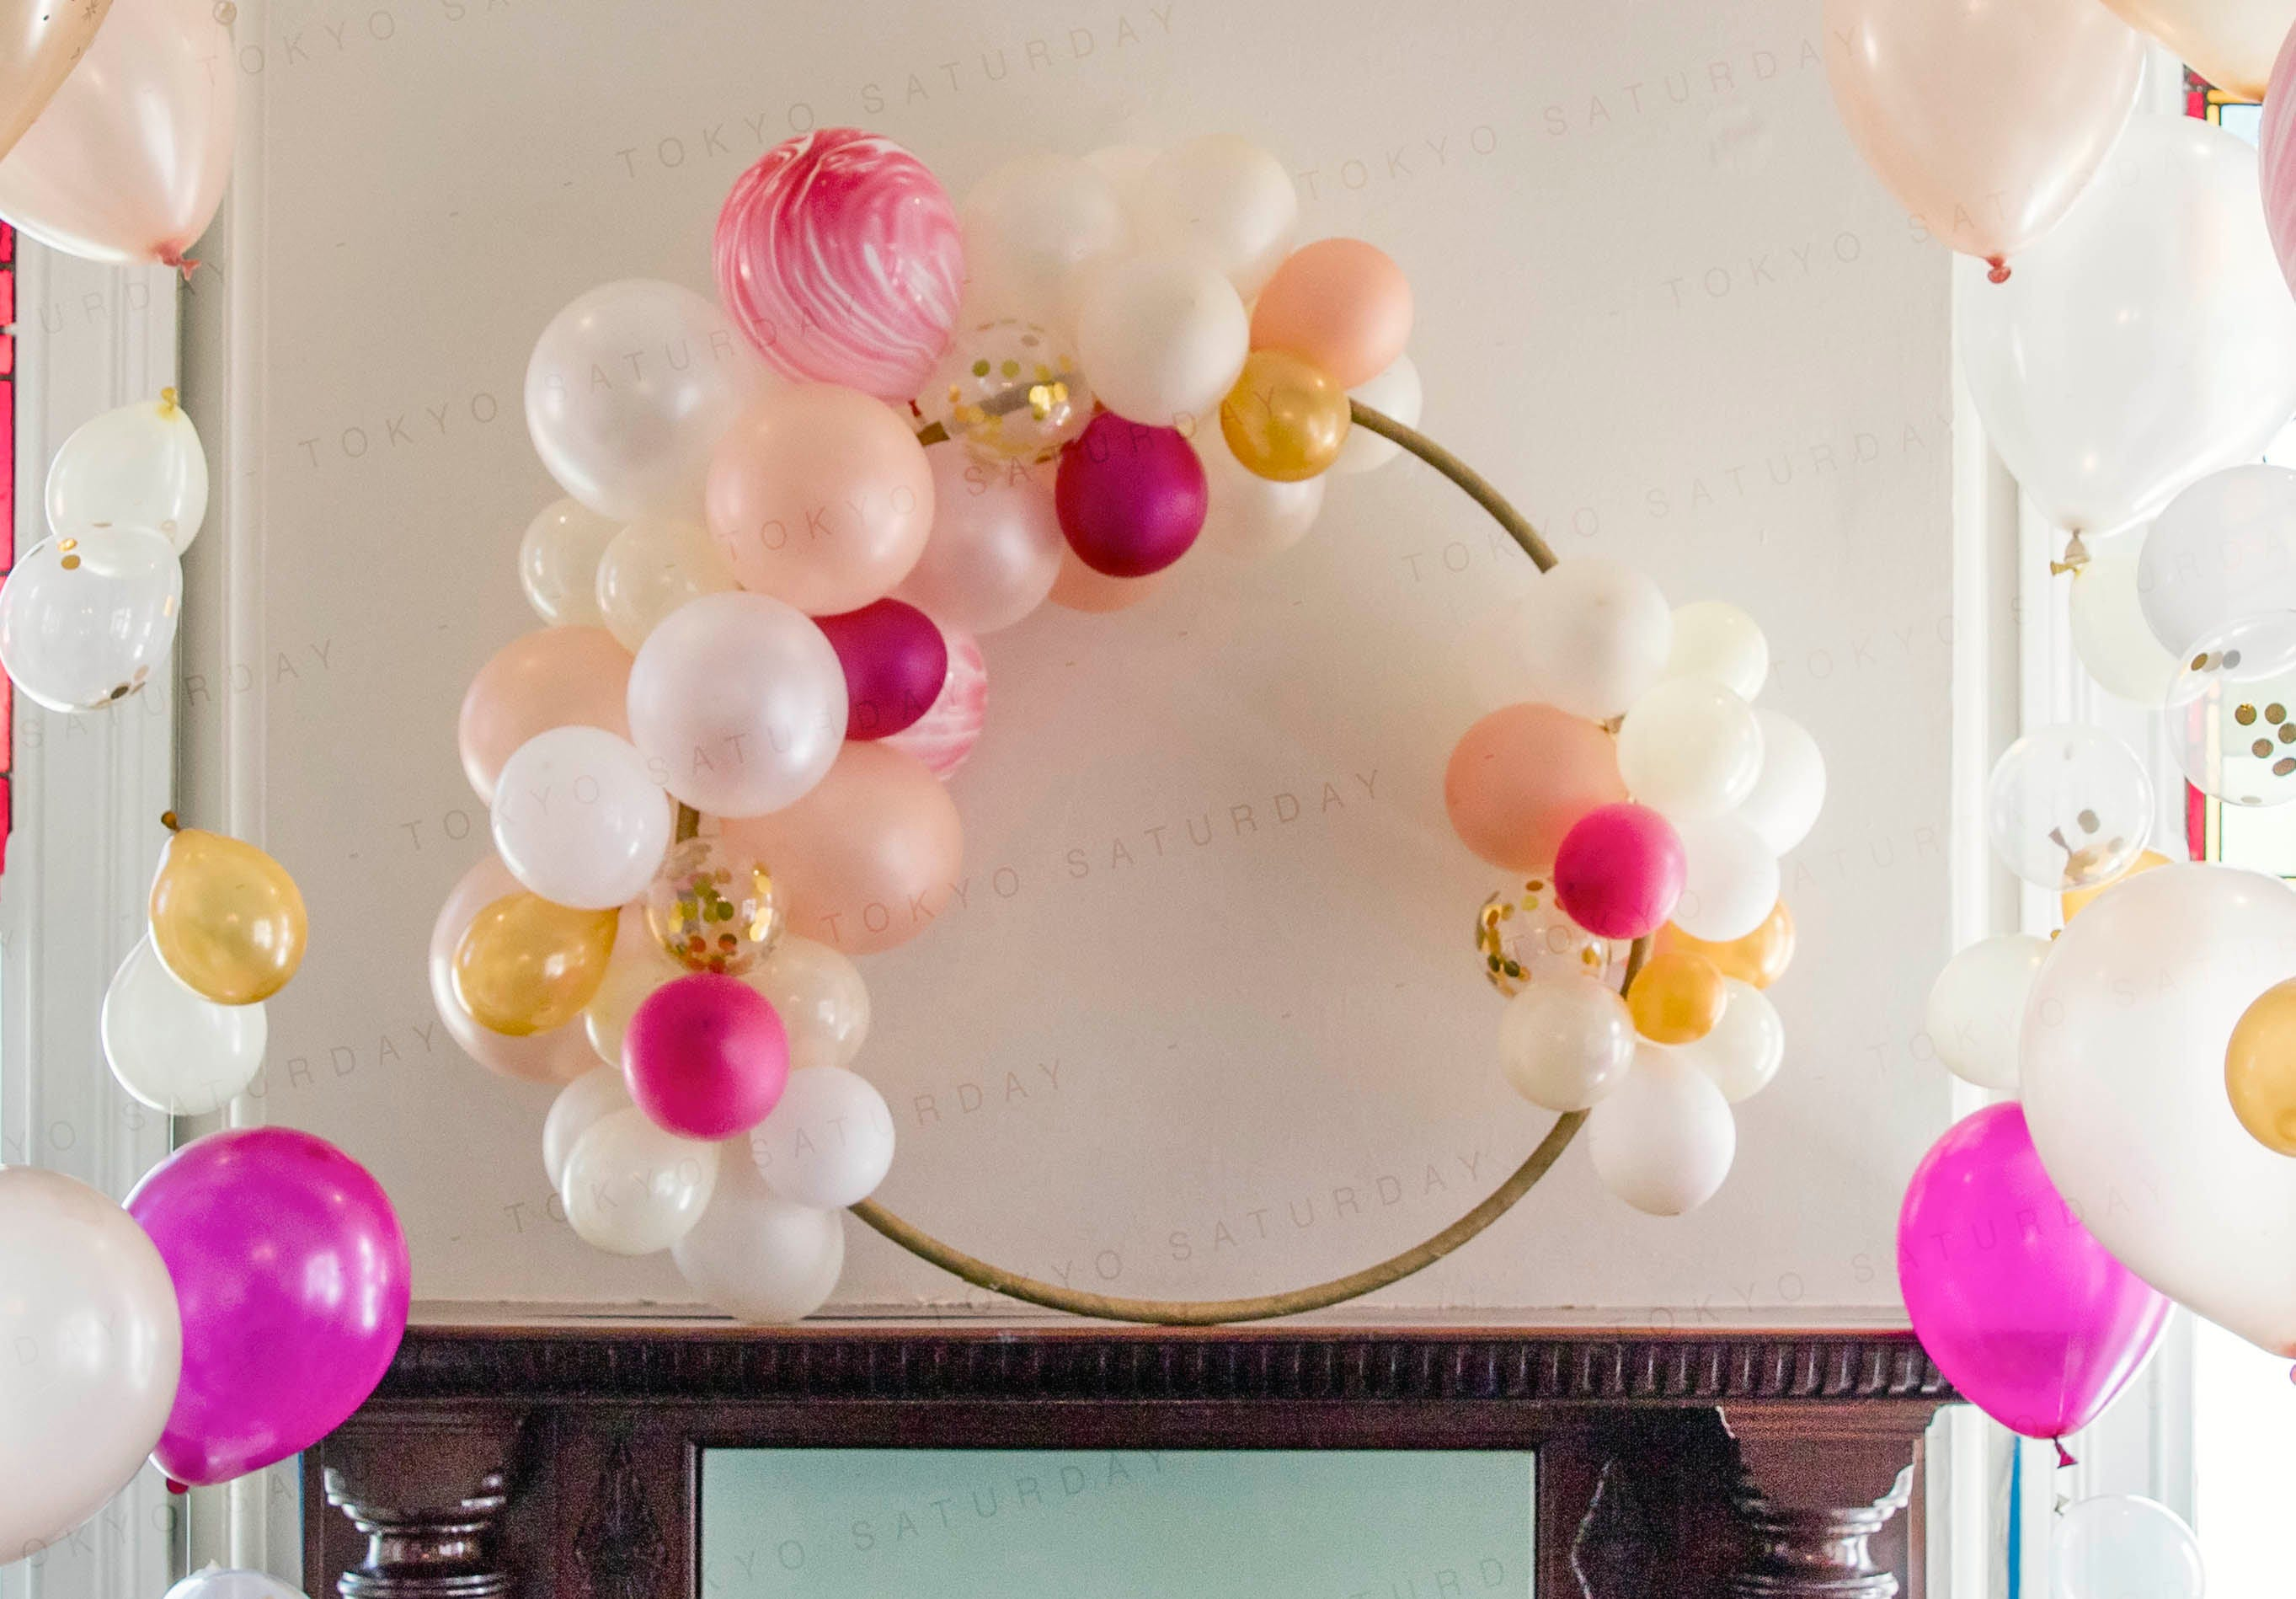 Party Balloon Decoration Balloon Hoop Wedding Party Birthday